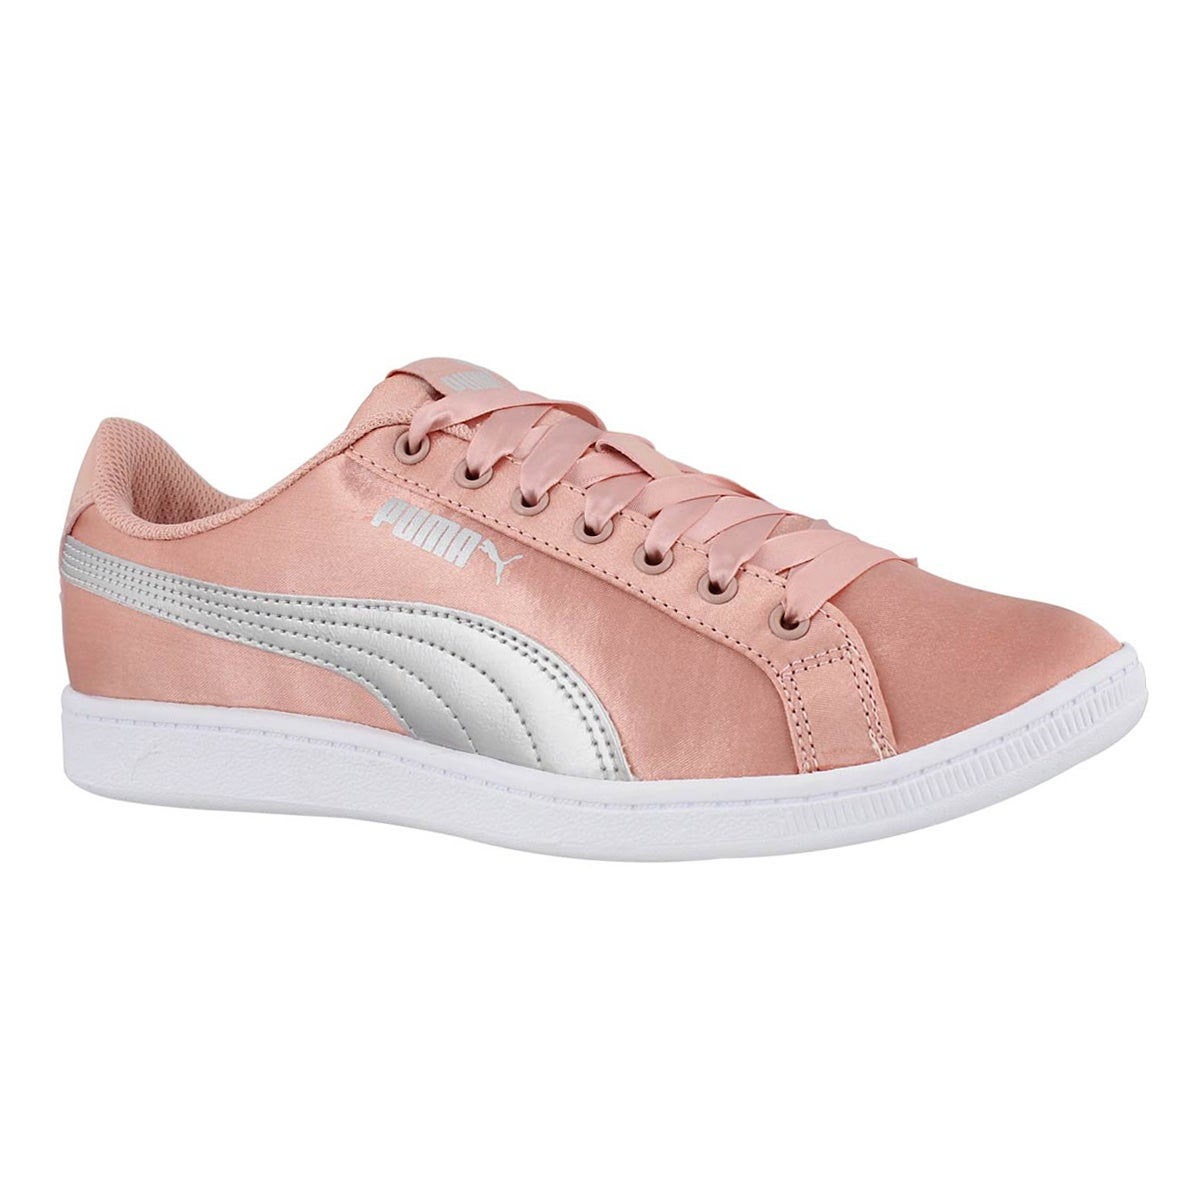 Women's PUMA VIKKY peach/silver sneakers